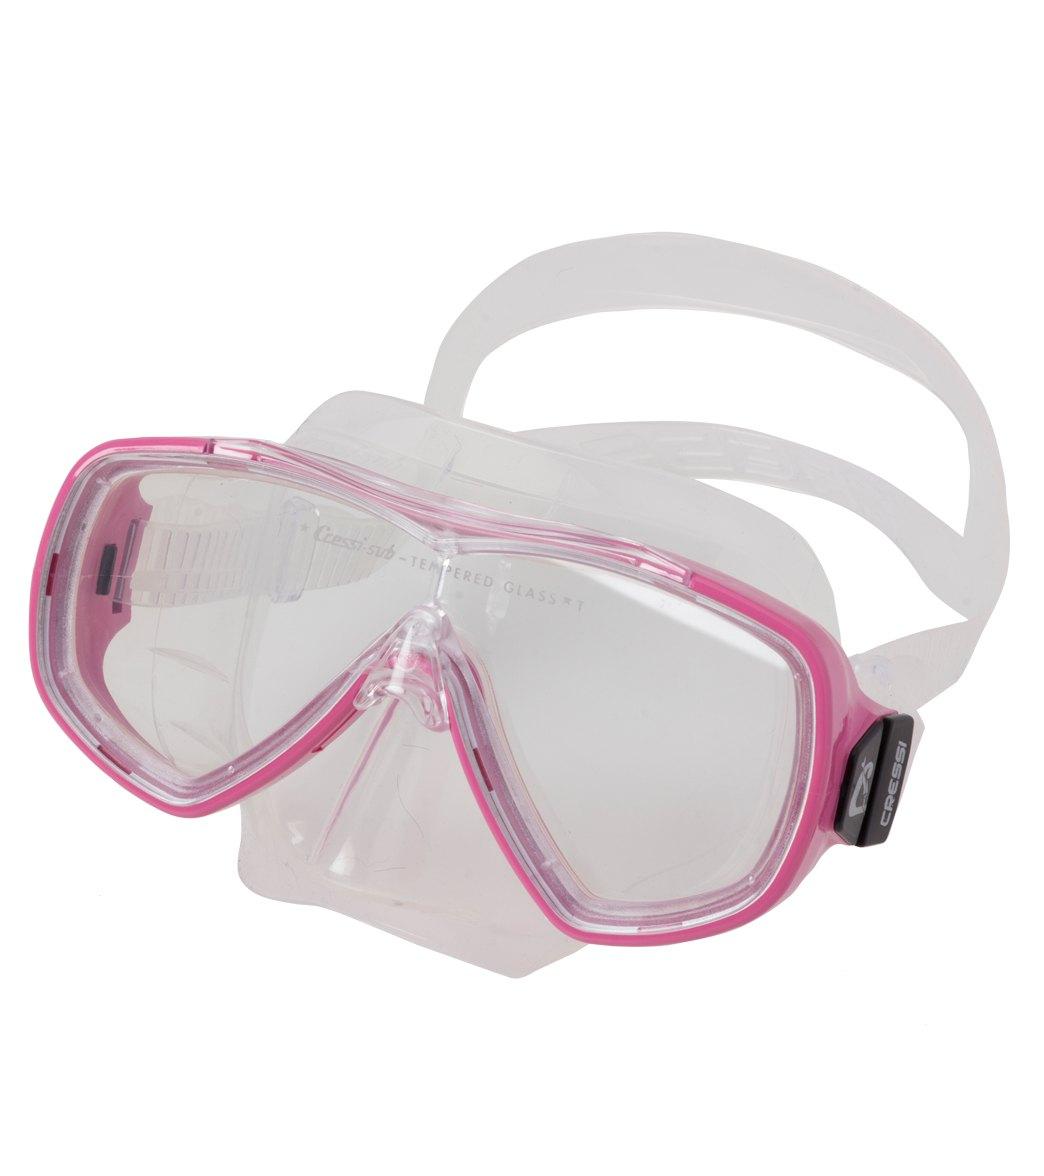 cressi palau bag mask snorkel and fin set at swimoutlet com free